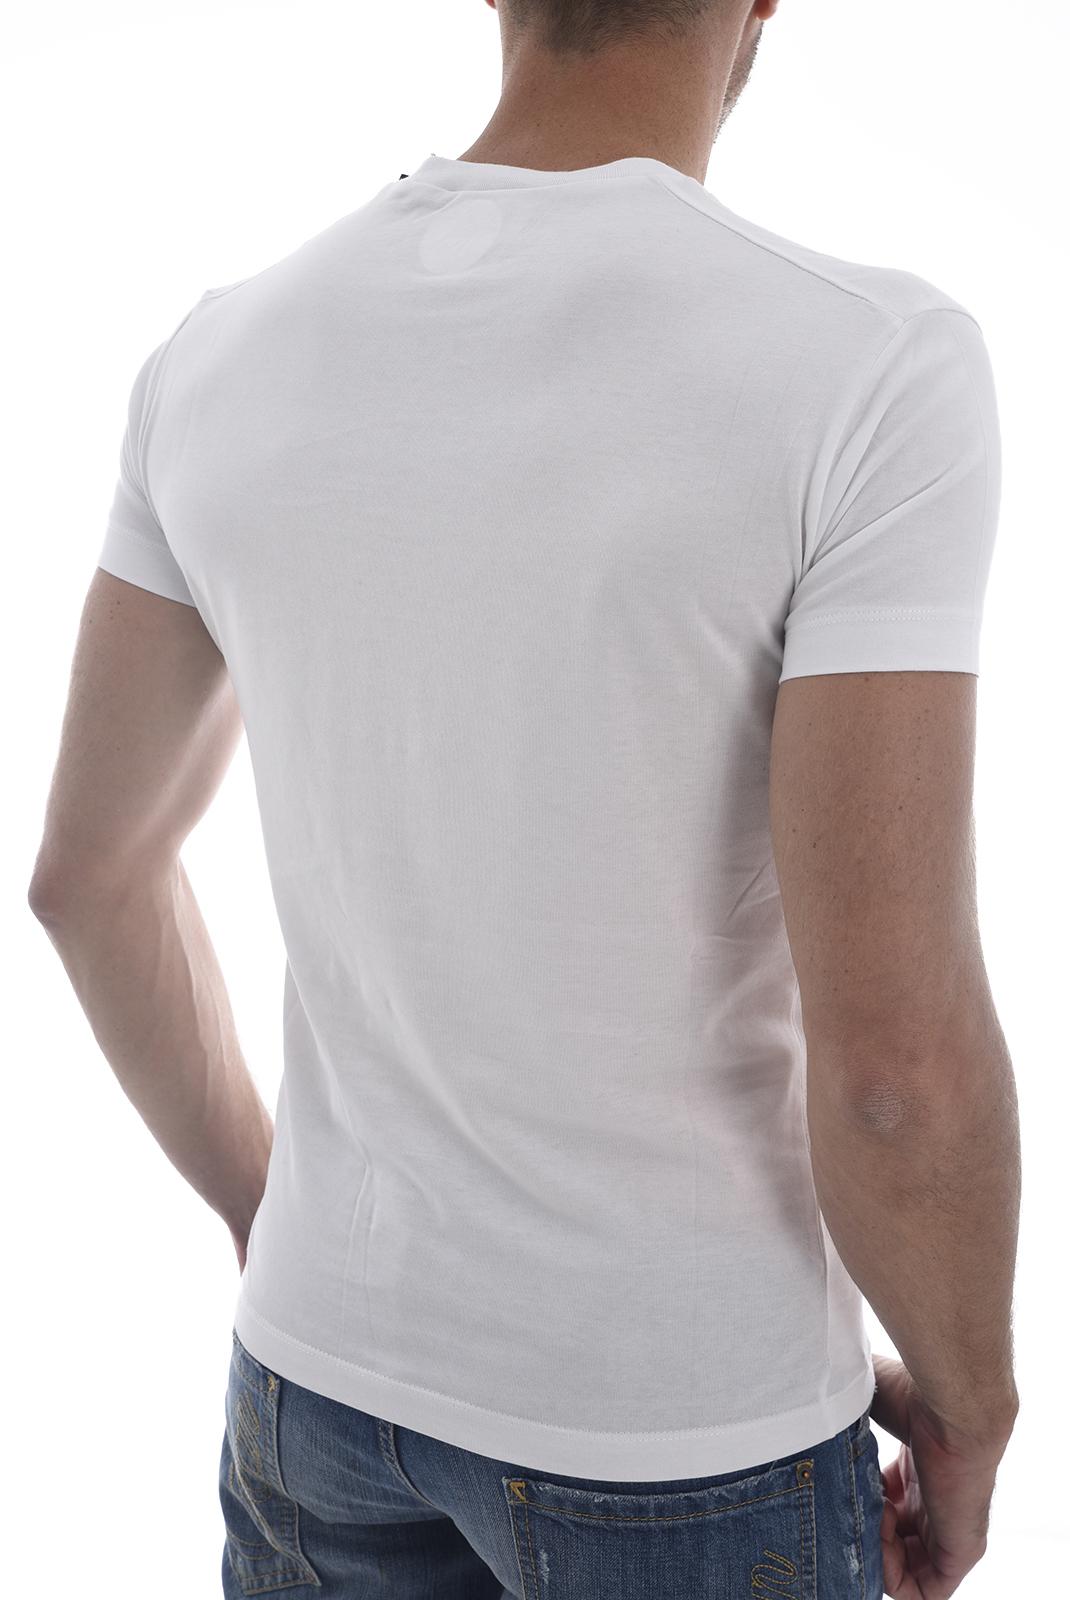 Tee-shirts  Dsquared2 S71GD0625 LION 100 BLANC